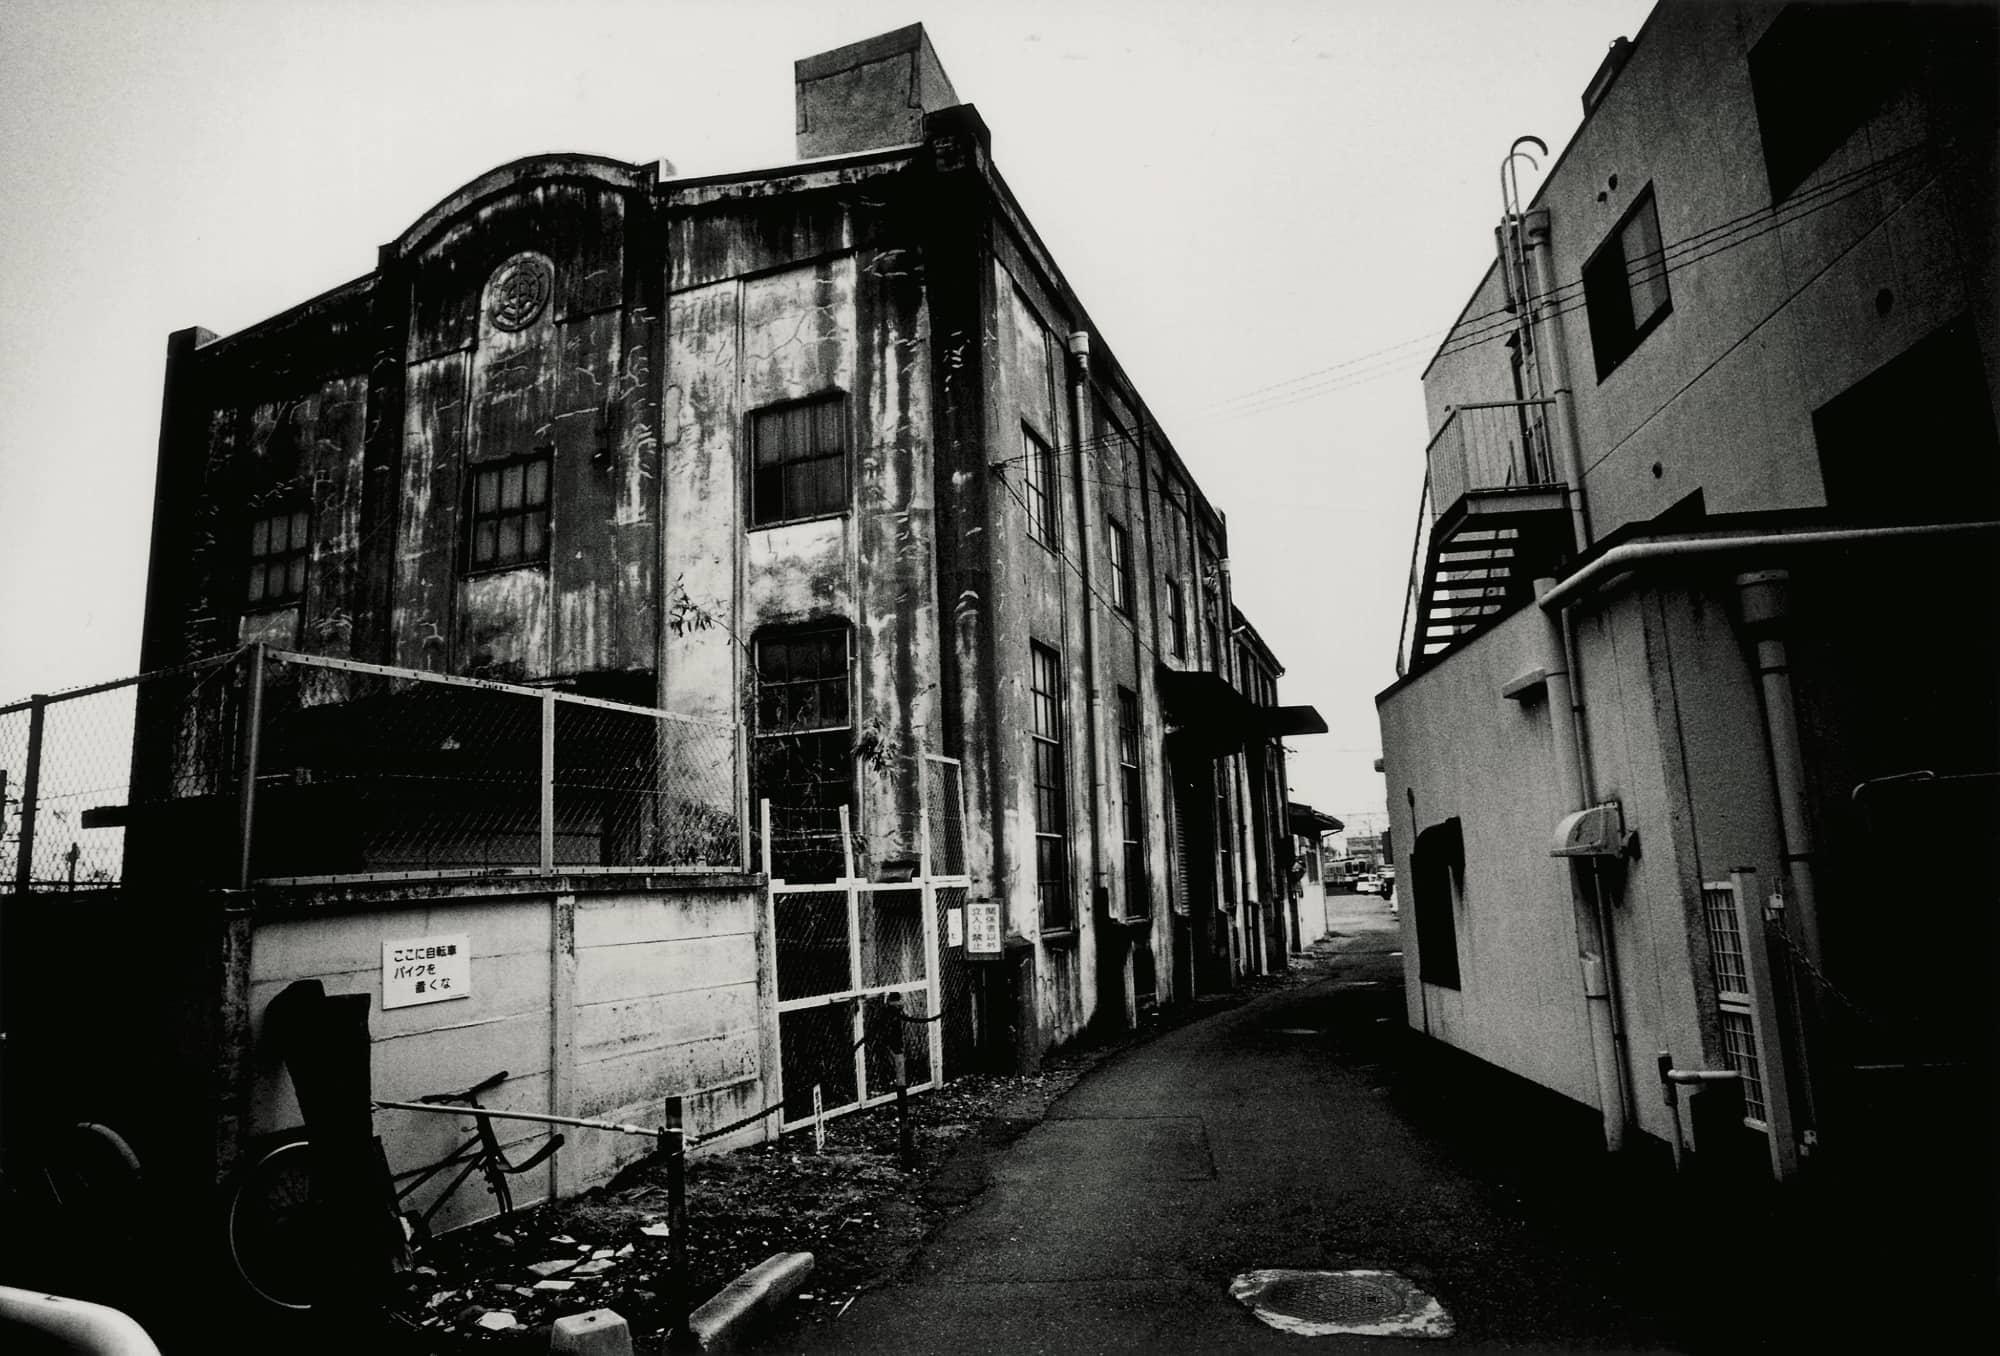 Daido Moriyama straatfoto